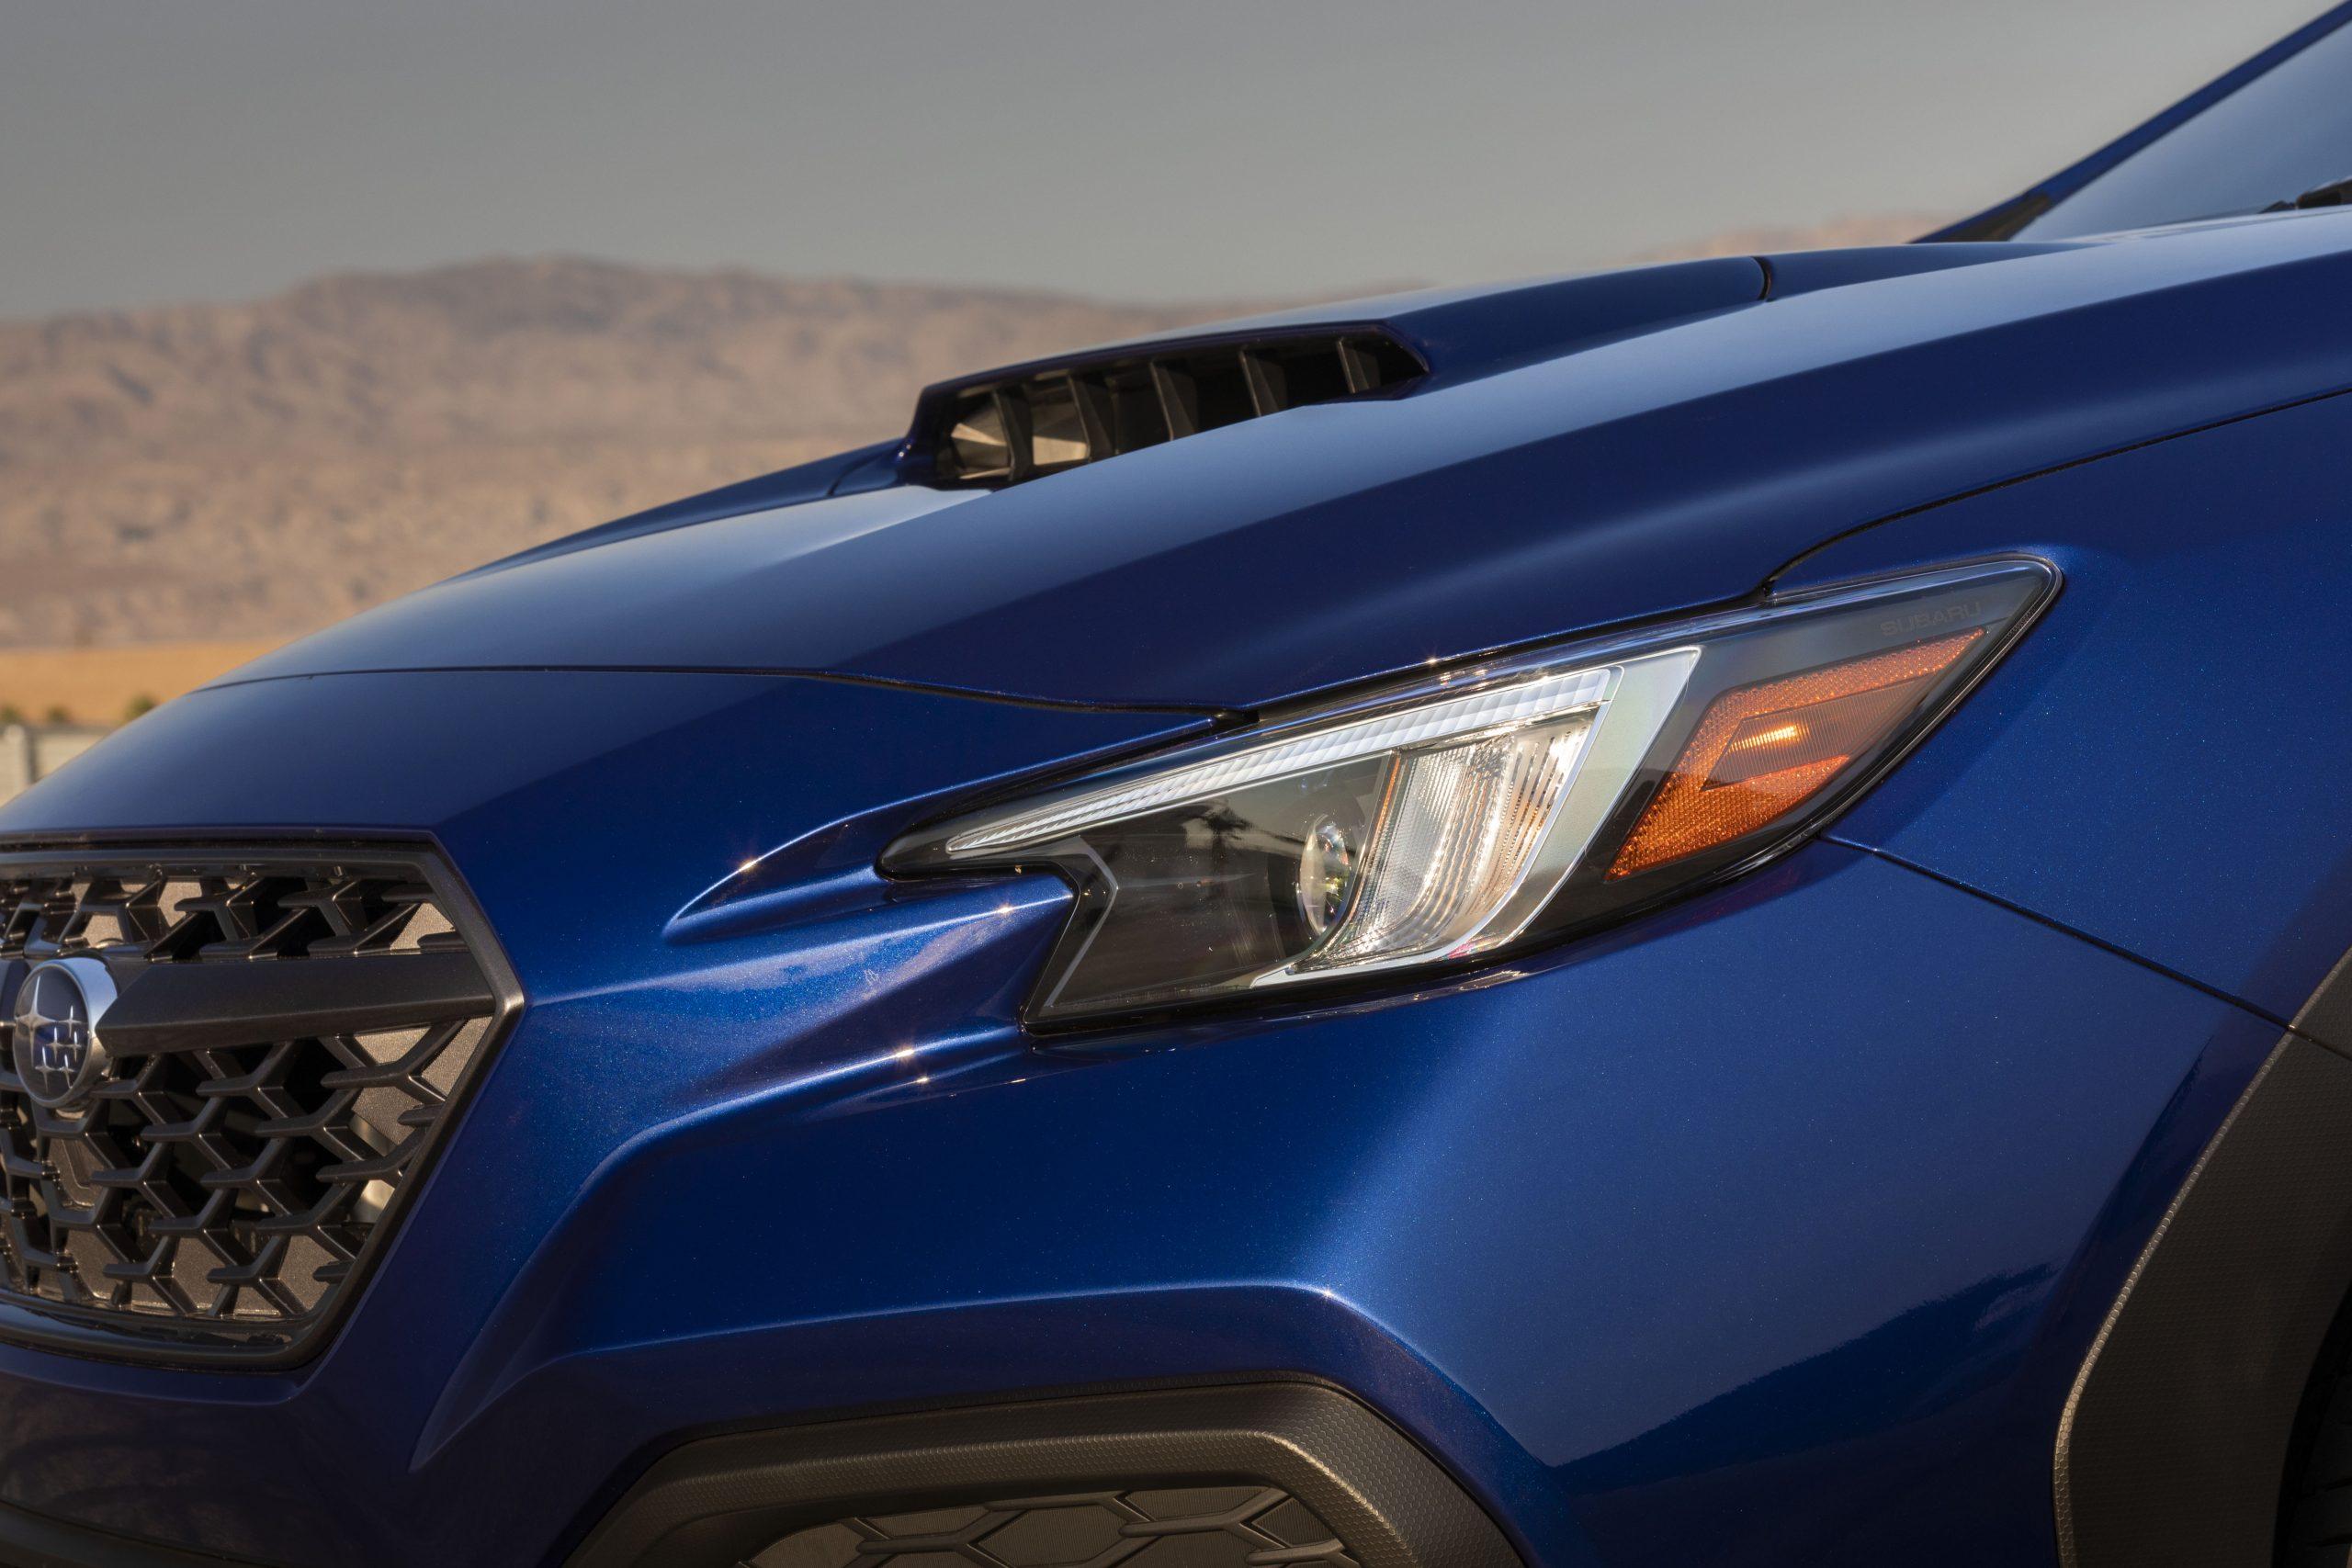 2022 Subaru WRX headlight hood detail